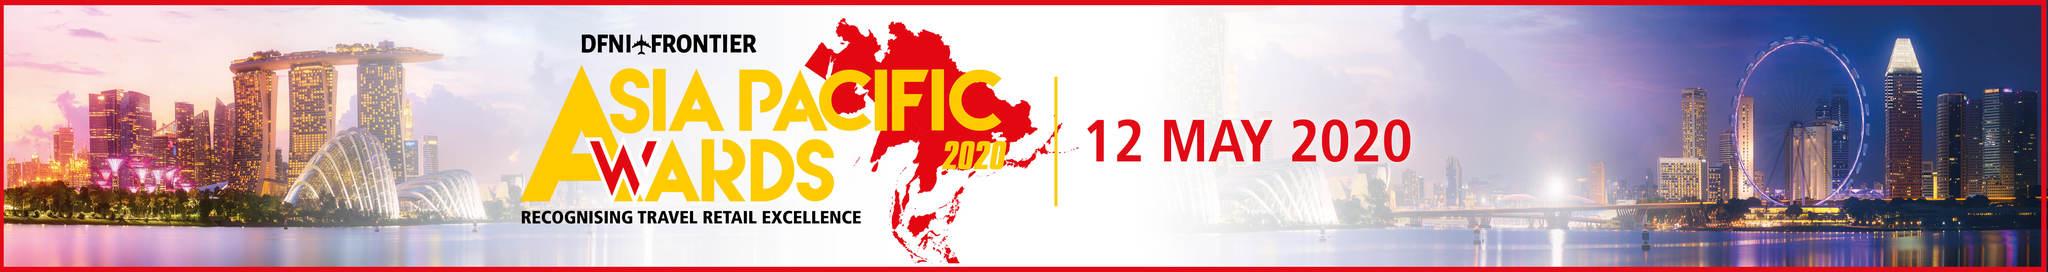 DFNI Asias Web banner logo